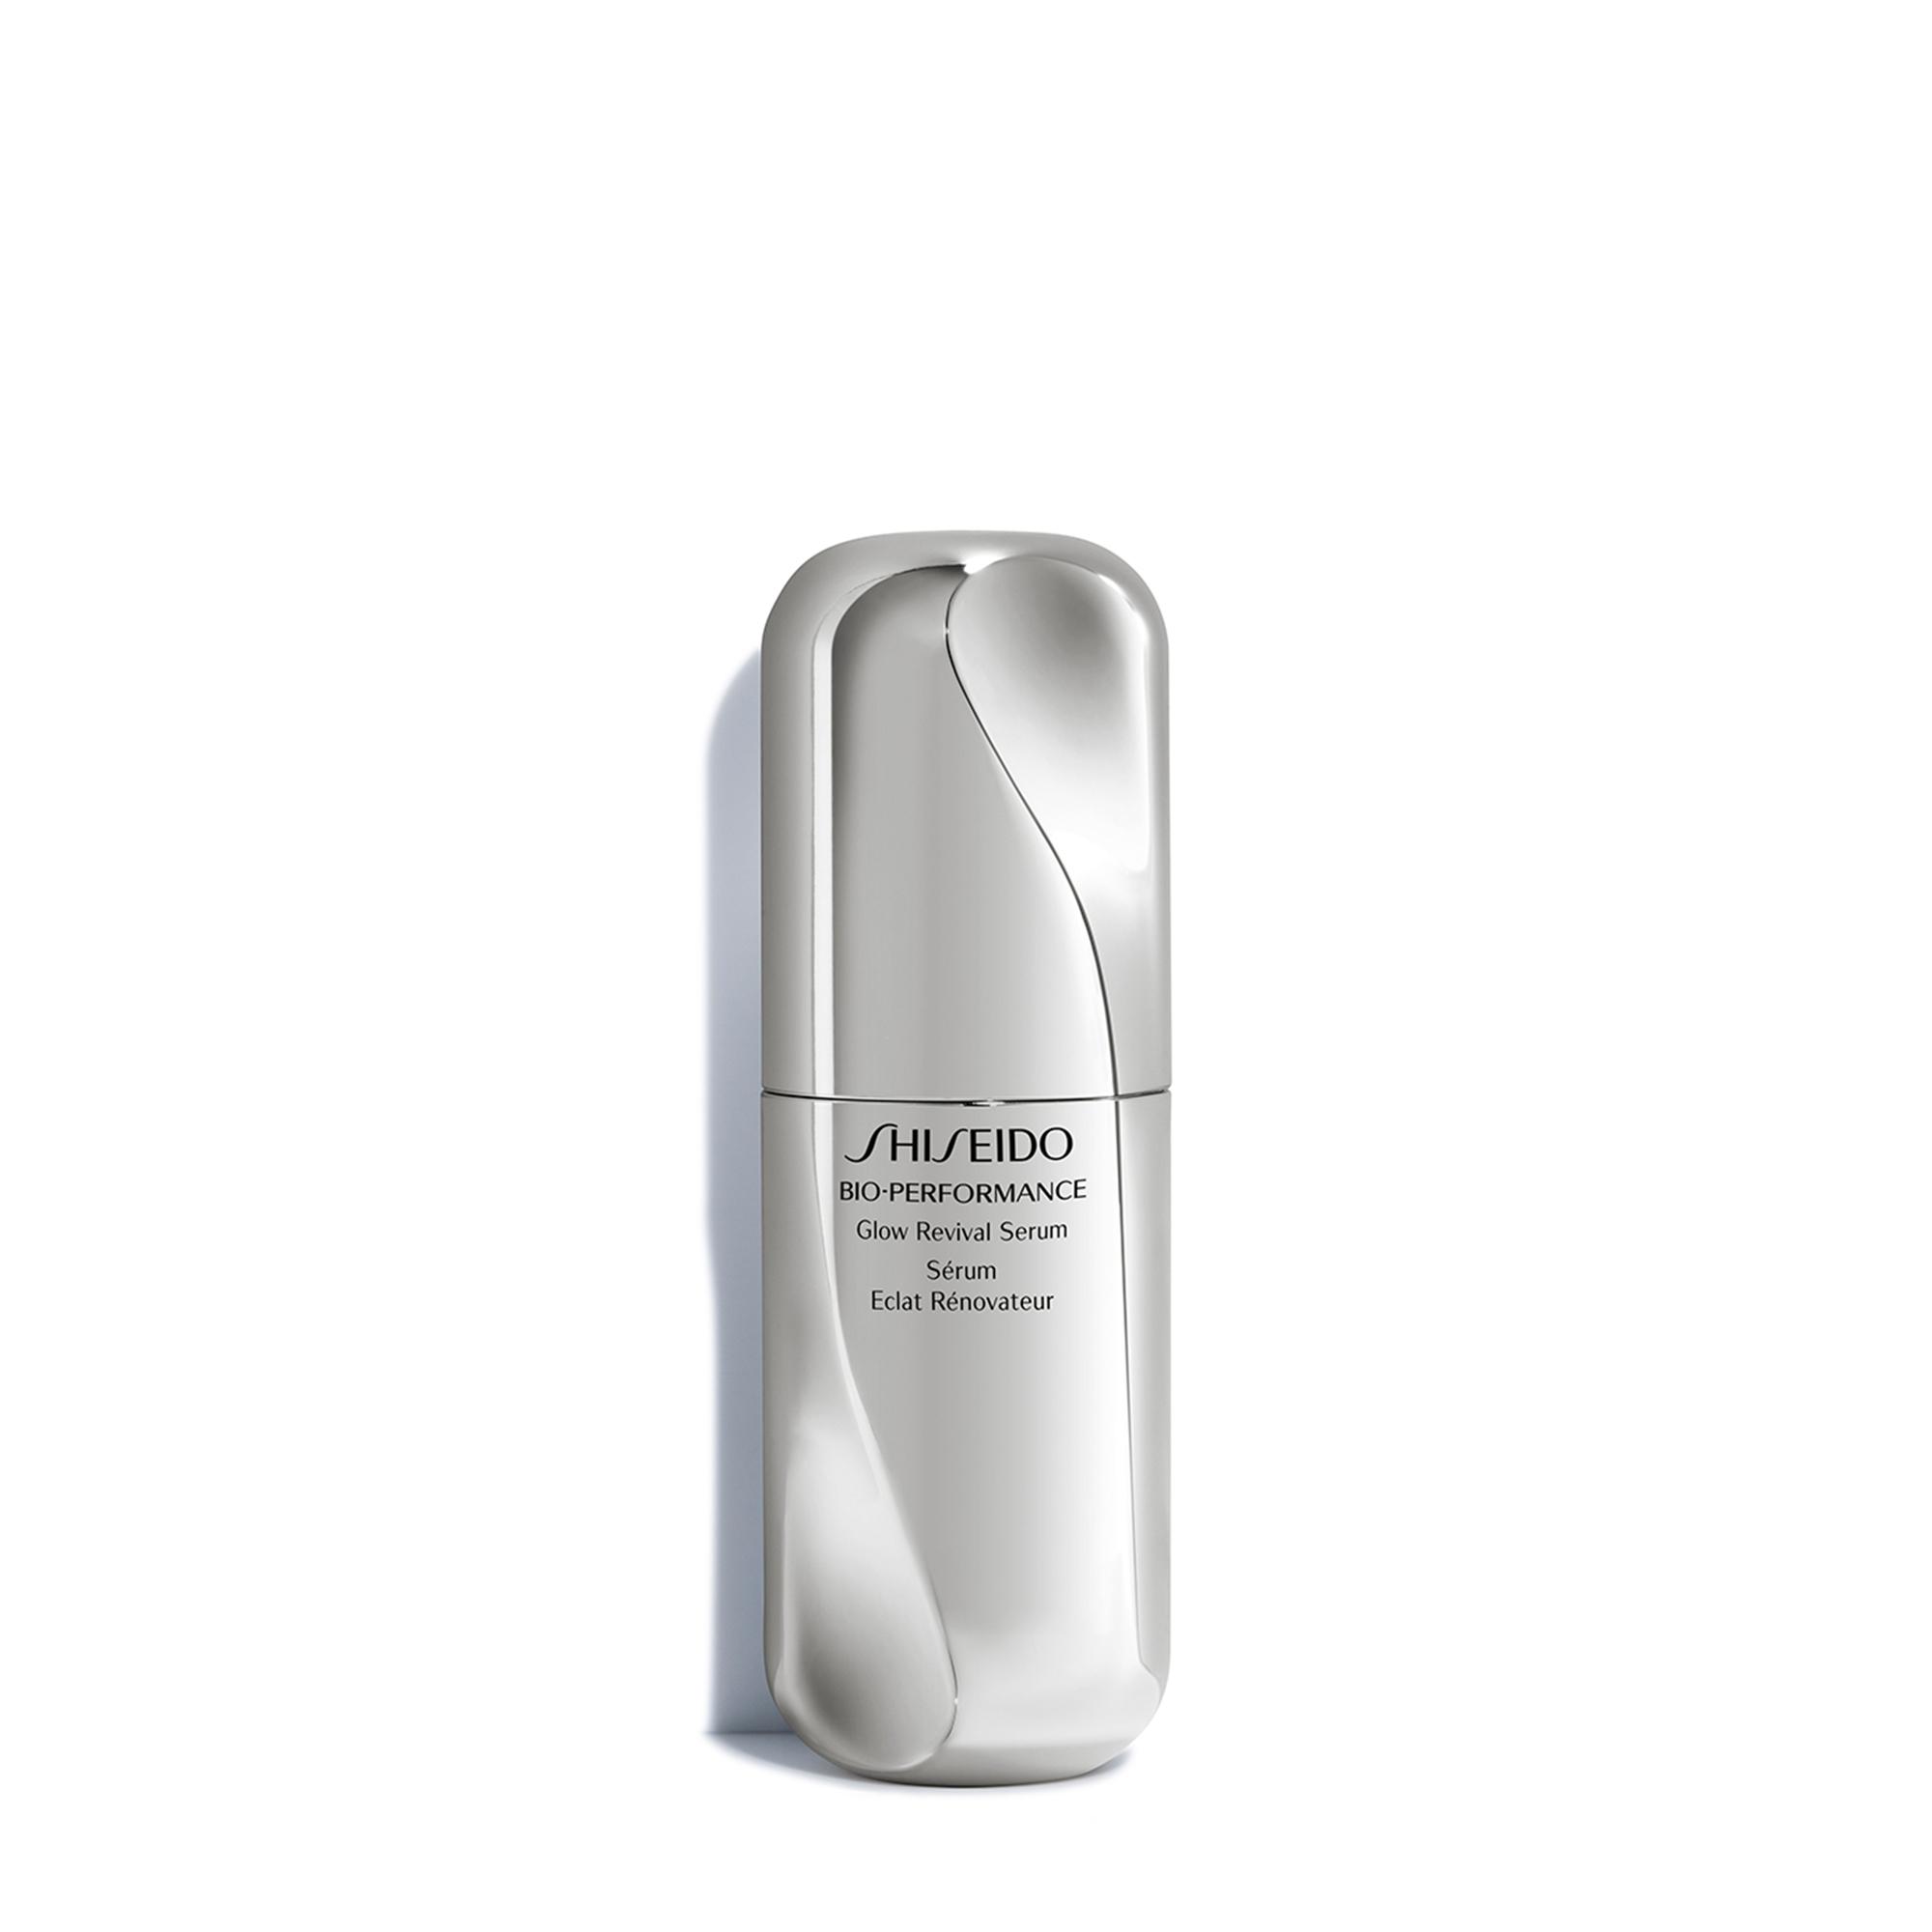 Bio Performance Glow Revival Serum Shiseido Glowing